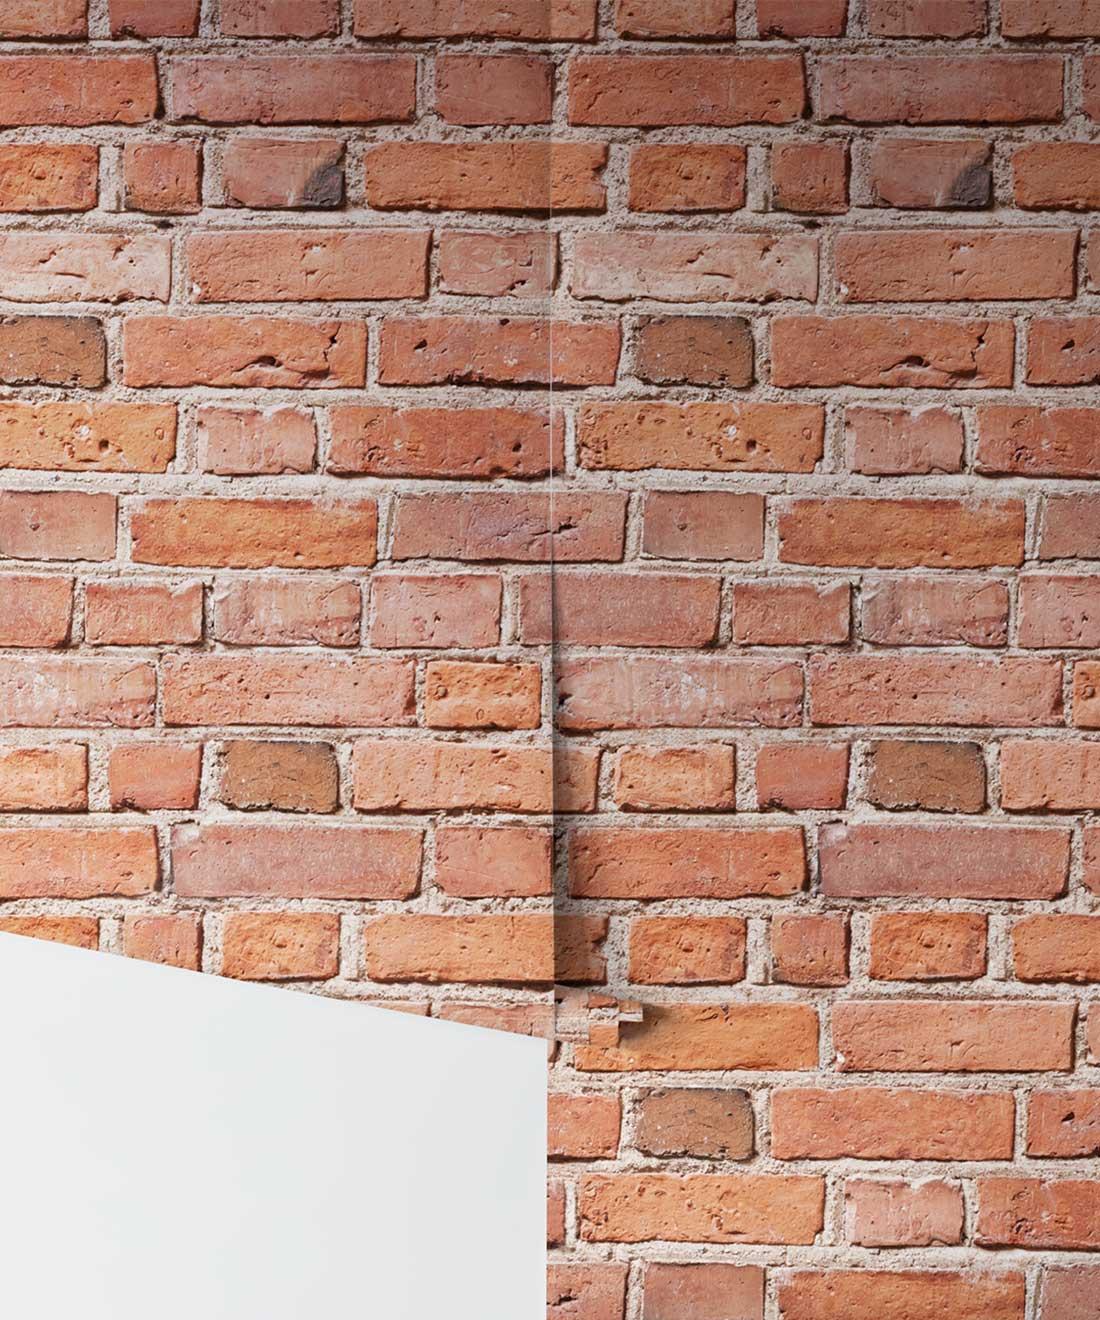 Classic Red Bricks Wallpaper • Industrial Allure of Brick ...